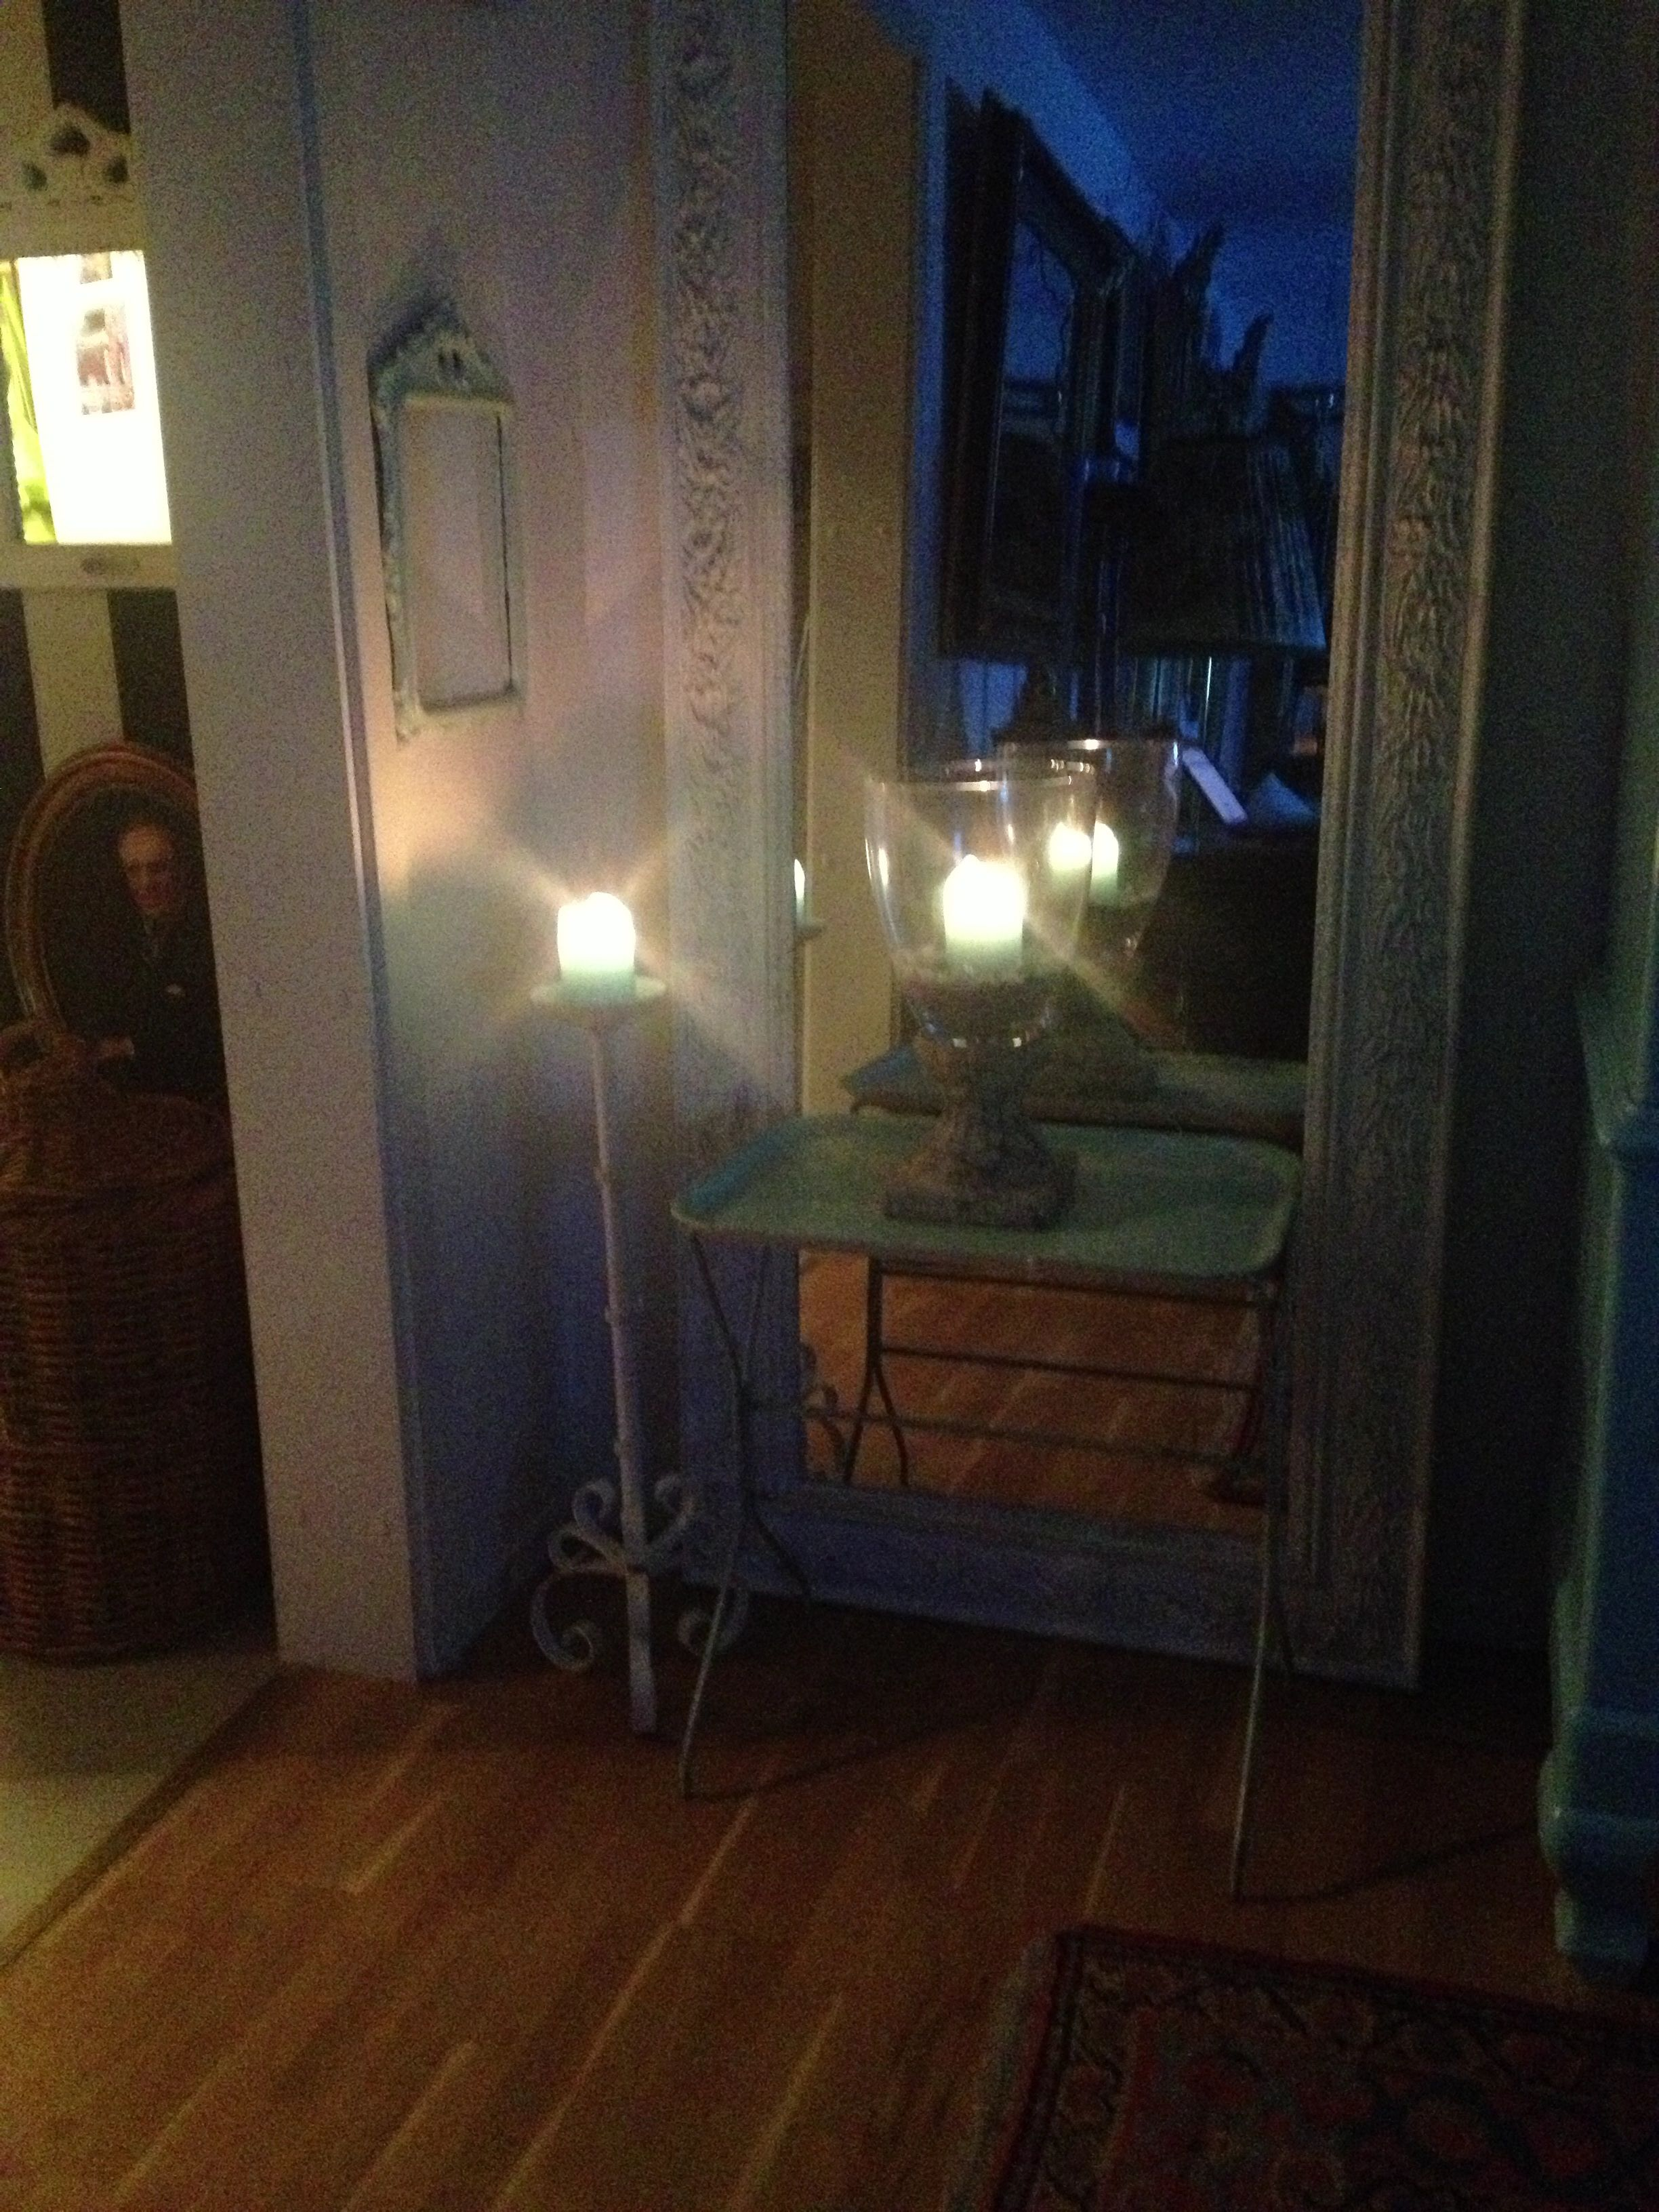 Evening candellighting